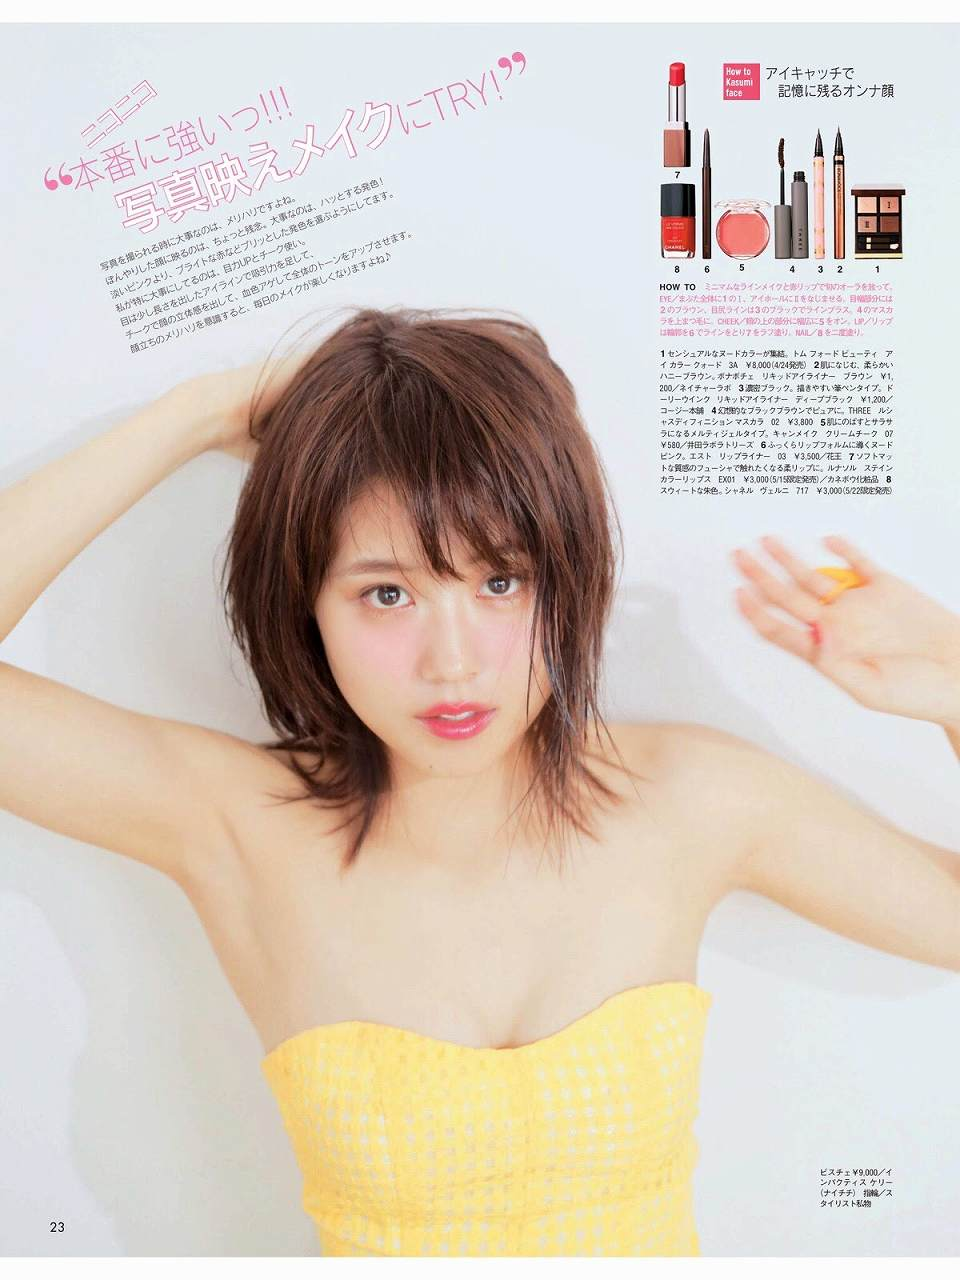 雑誌「ar」5月号の有村架純